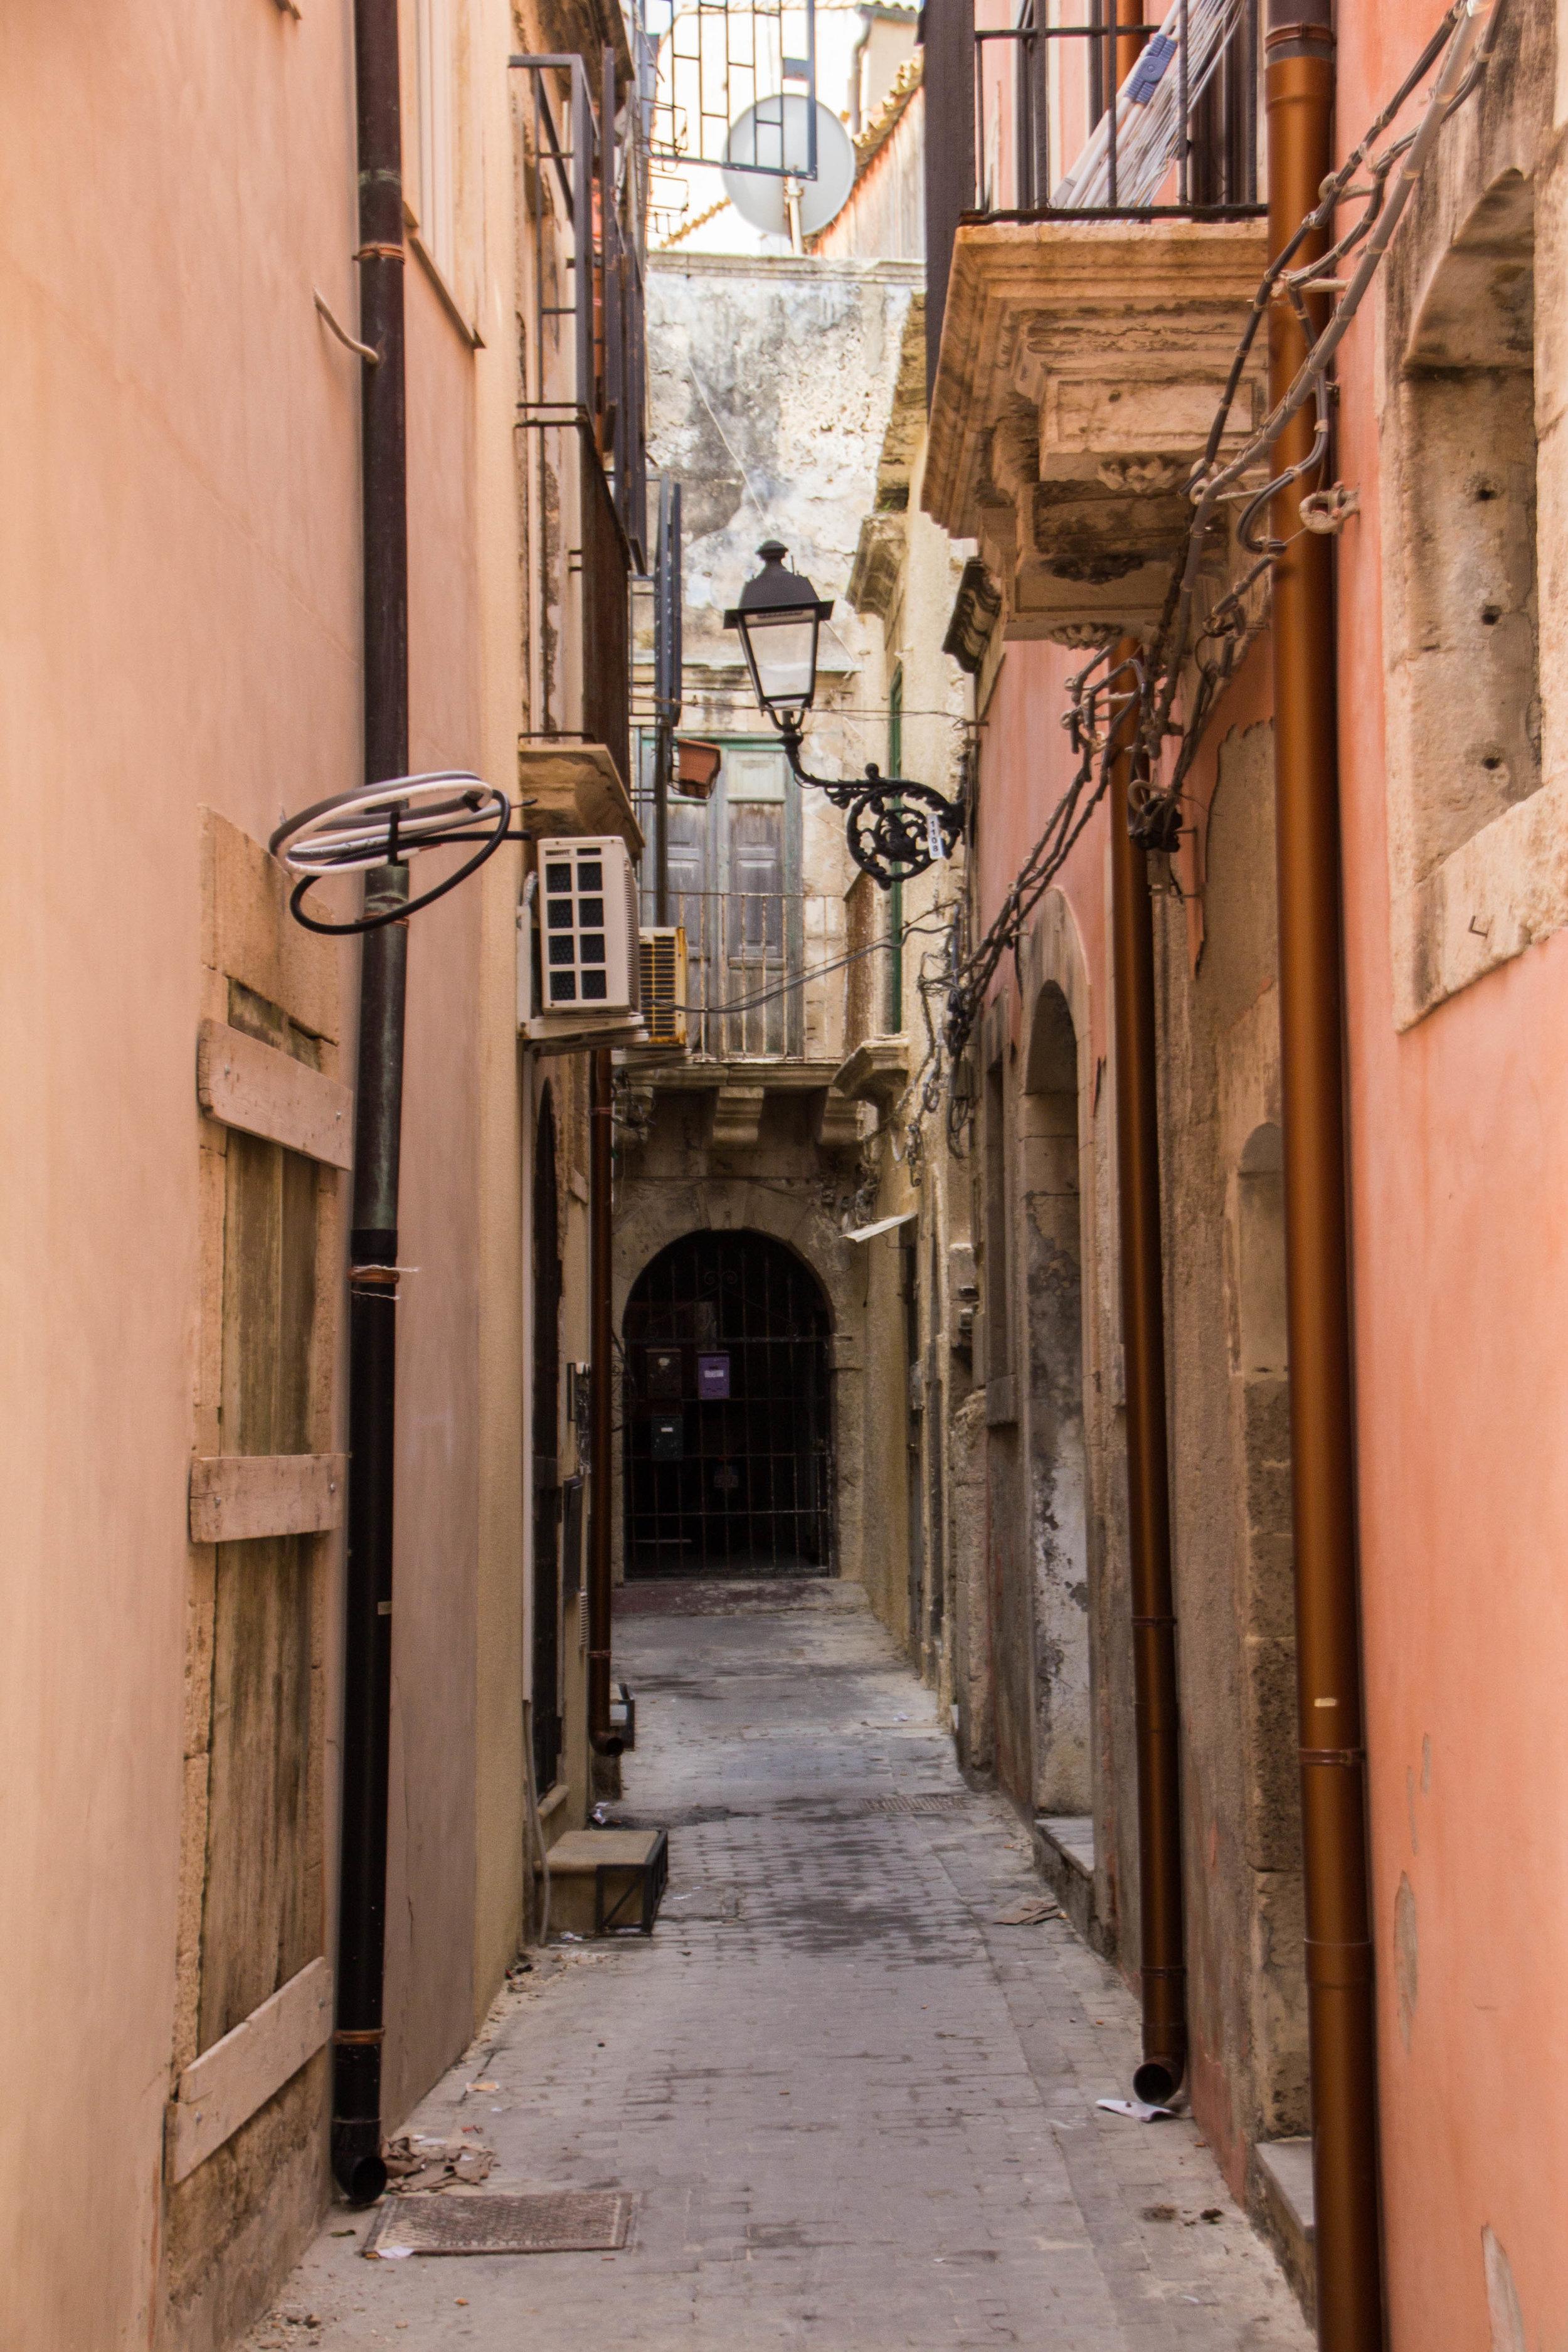 streets-ortygia-syracuse-sicily-31.jpg